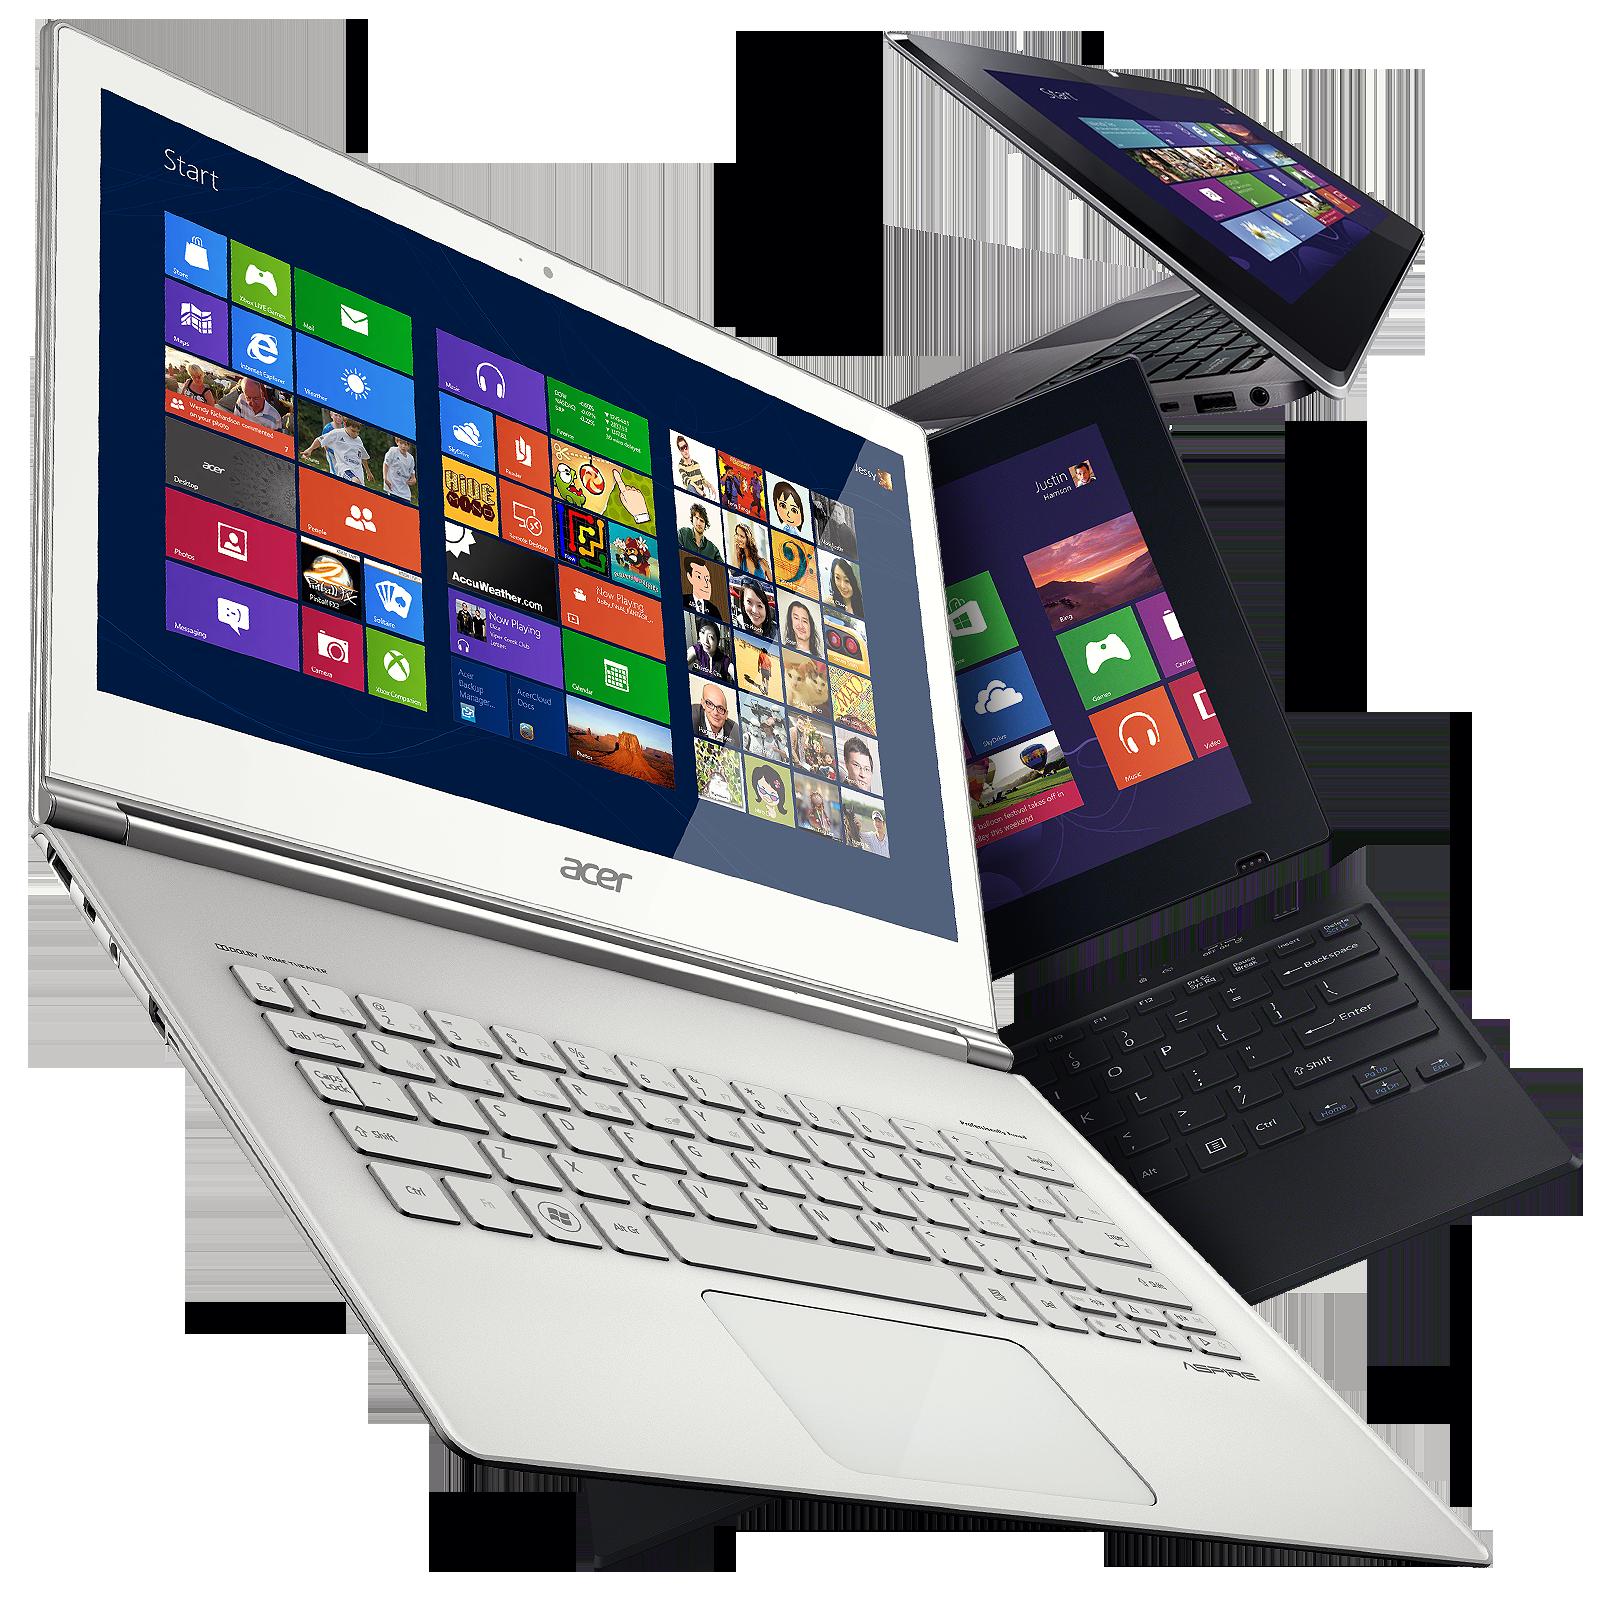 Laptop-PNG-Image-Transparent.png